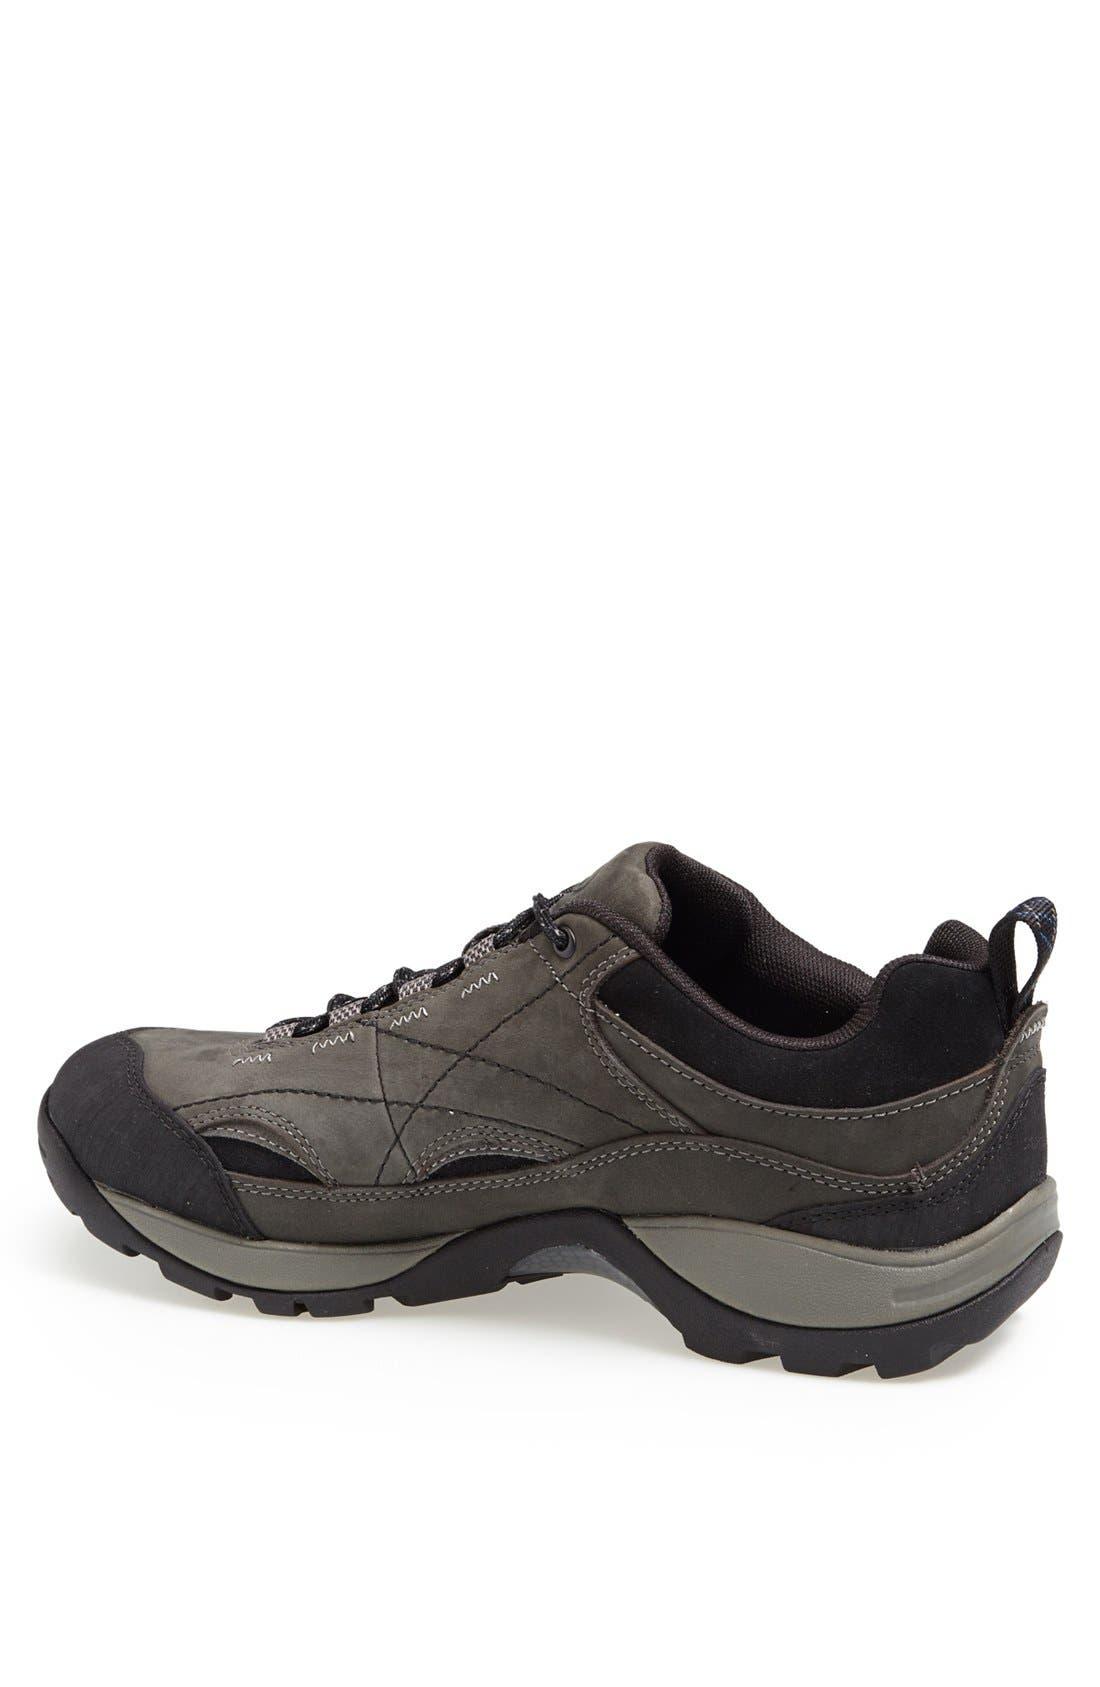 Alternate Image 2  - Chaco 'Hinterland' Hiking Shoe   (Men)